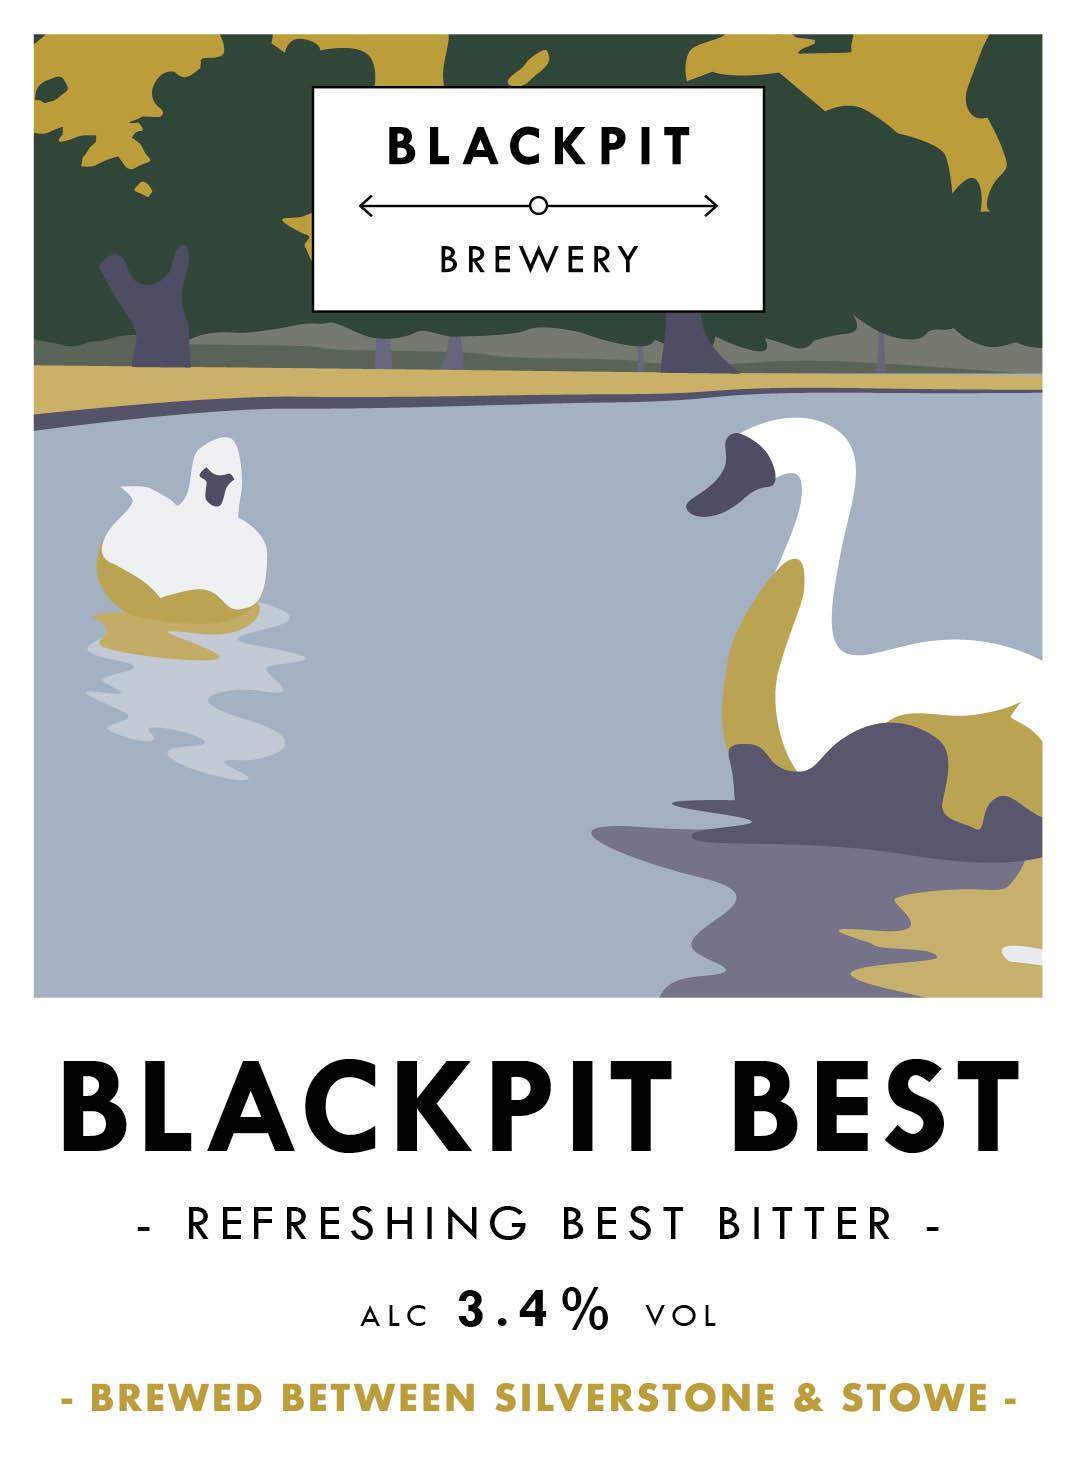 bb-blackpit best-beer-pump clip -1mm bleed v1 aa.jpg